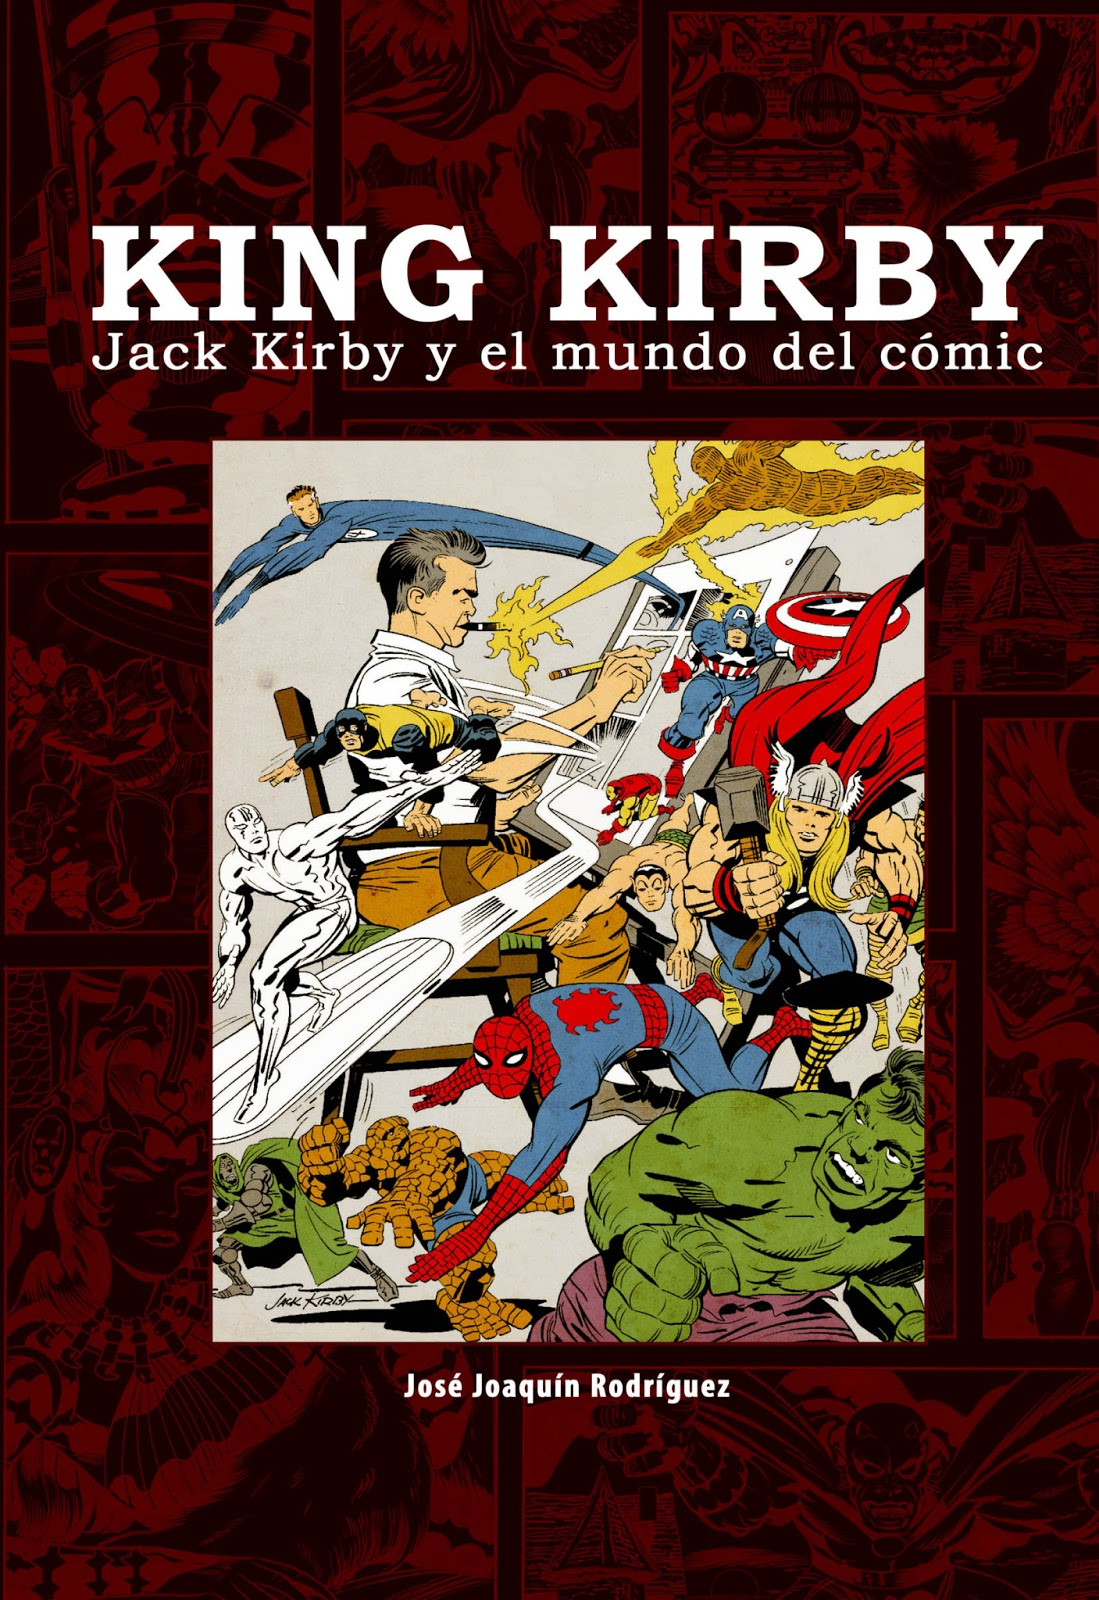 KING KIRBY: Jack Kirby y el mundo del cómic